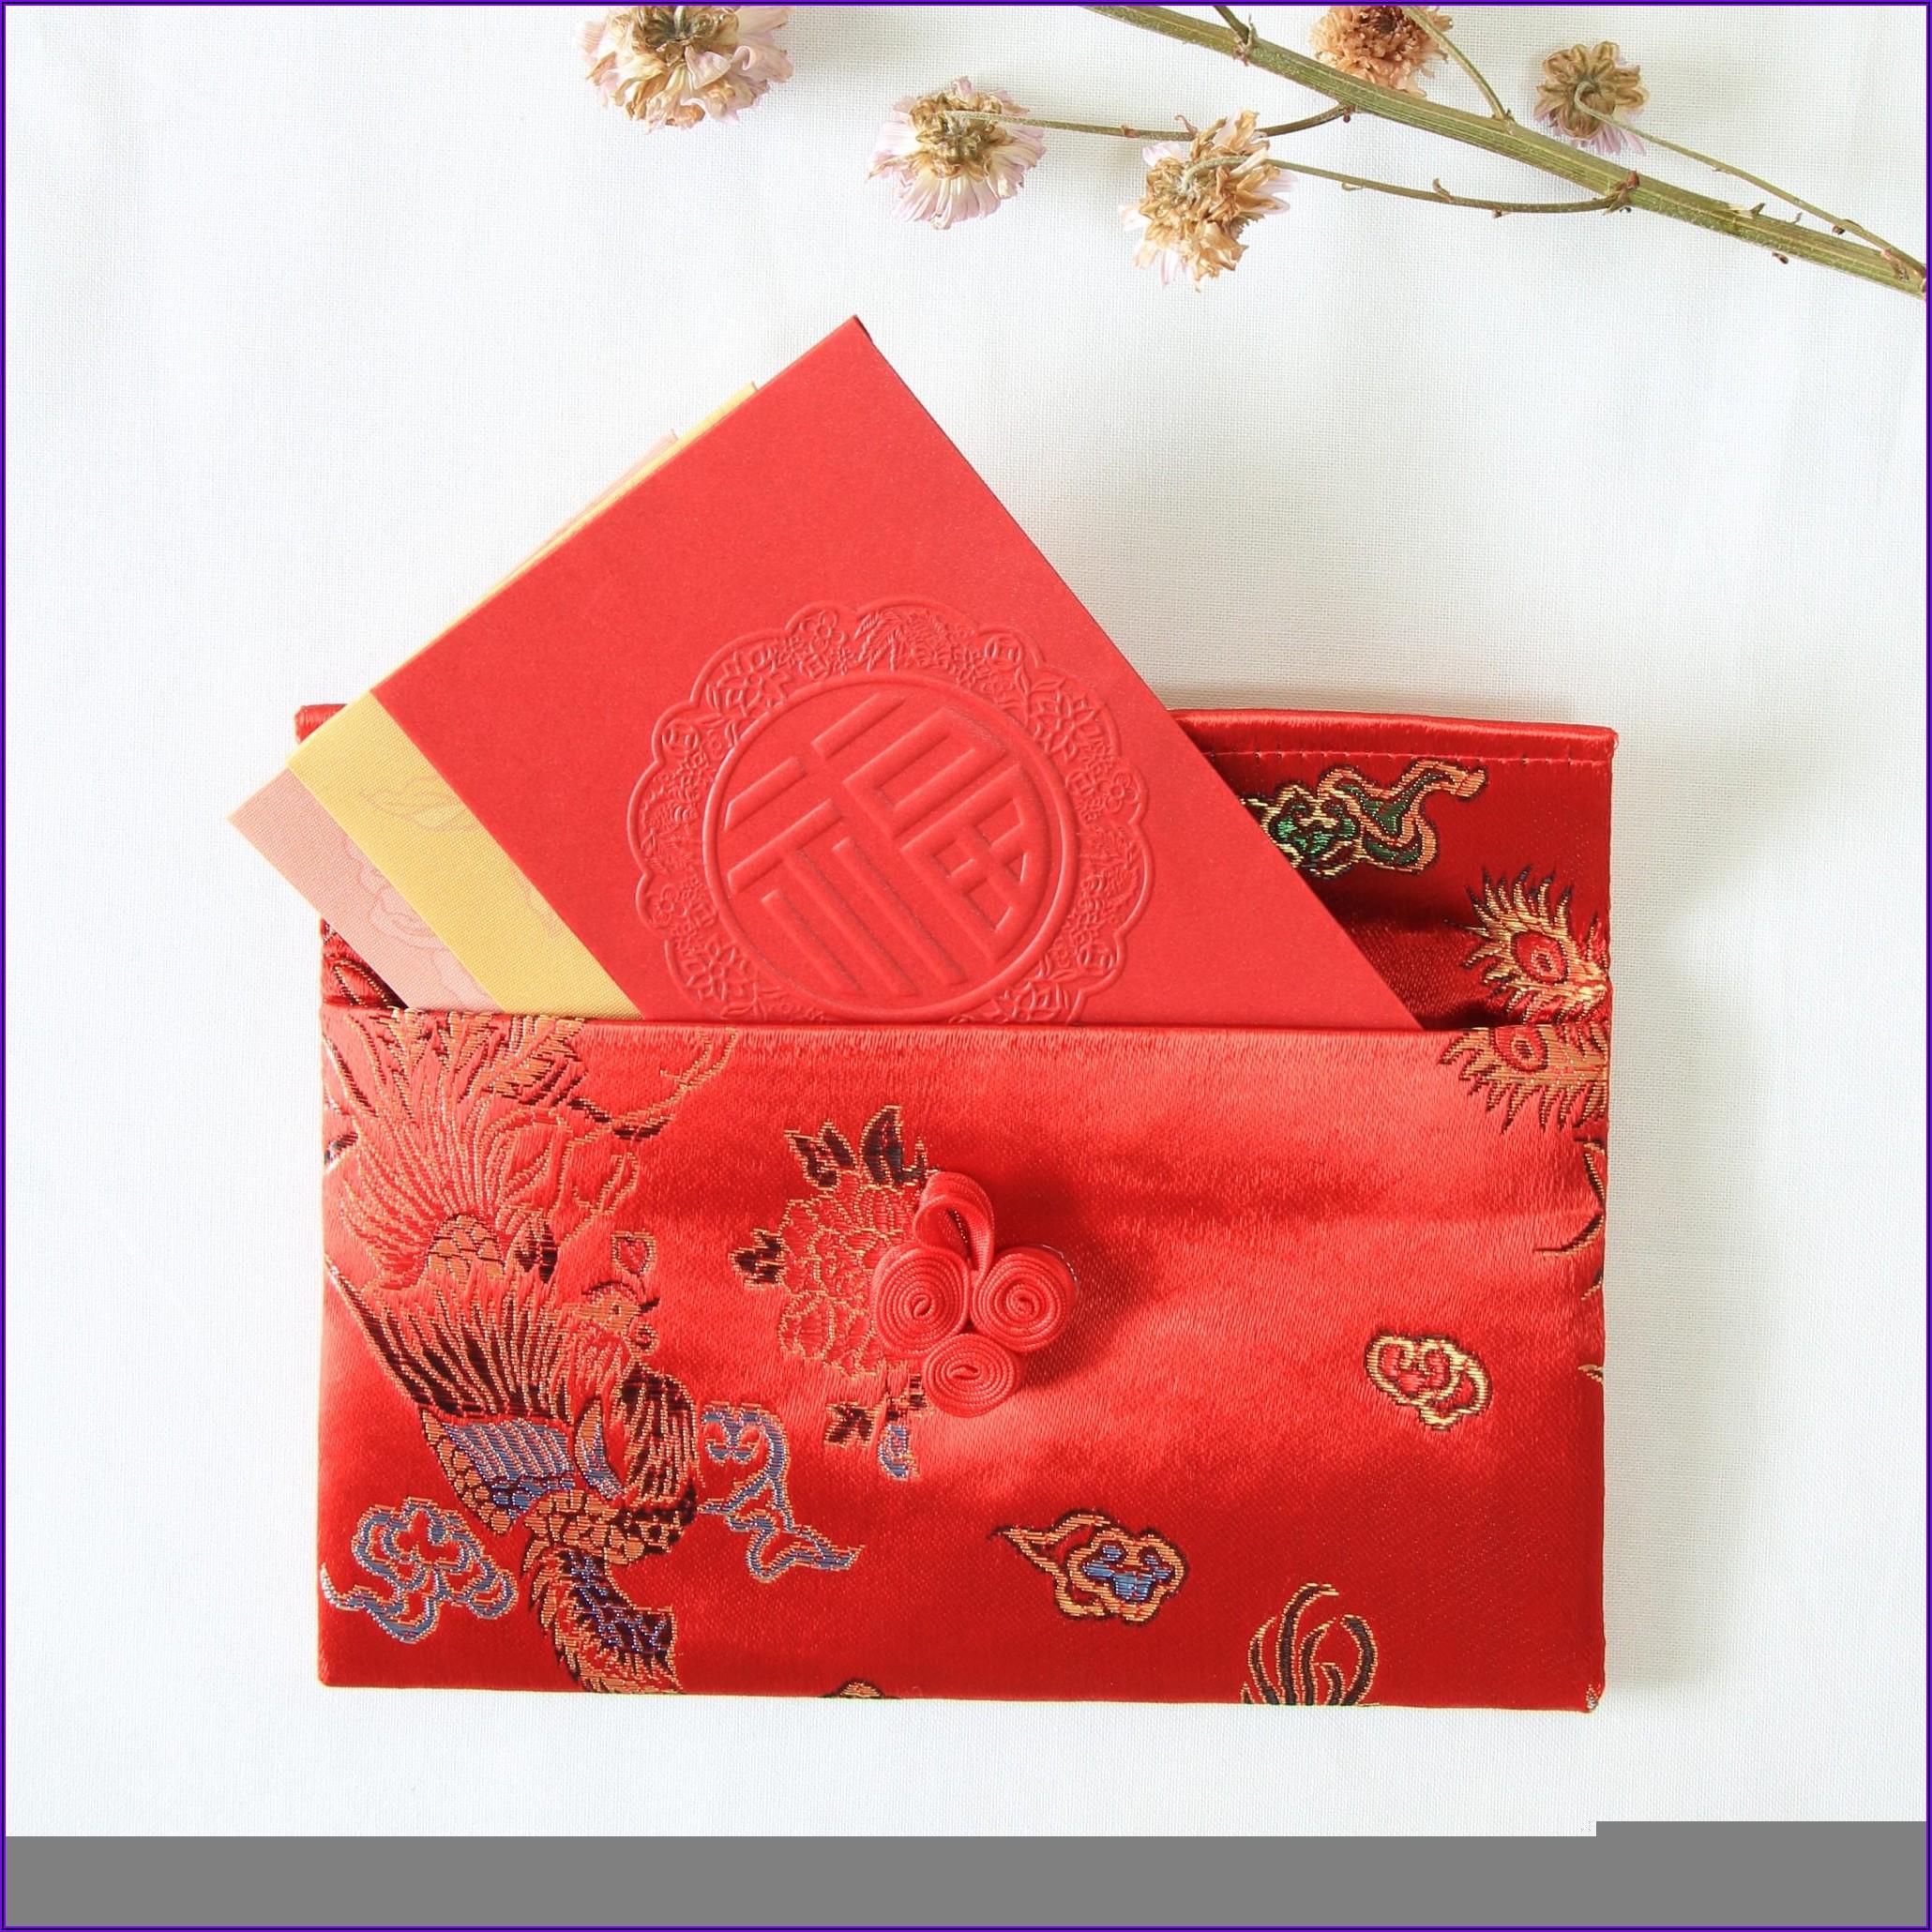 Vietnamese Wedding Gift Red Envelope